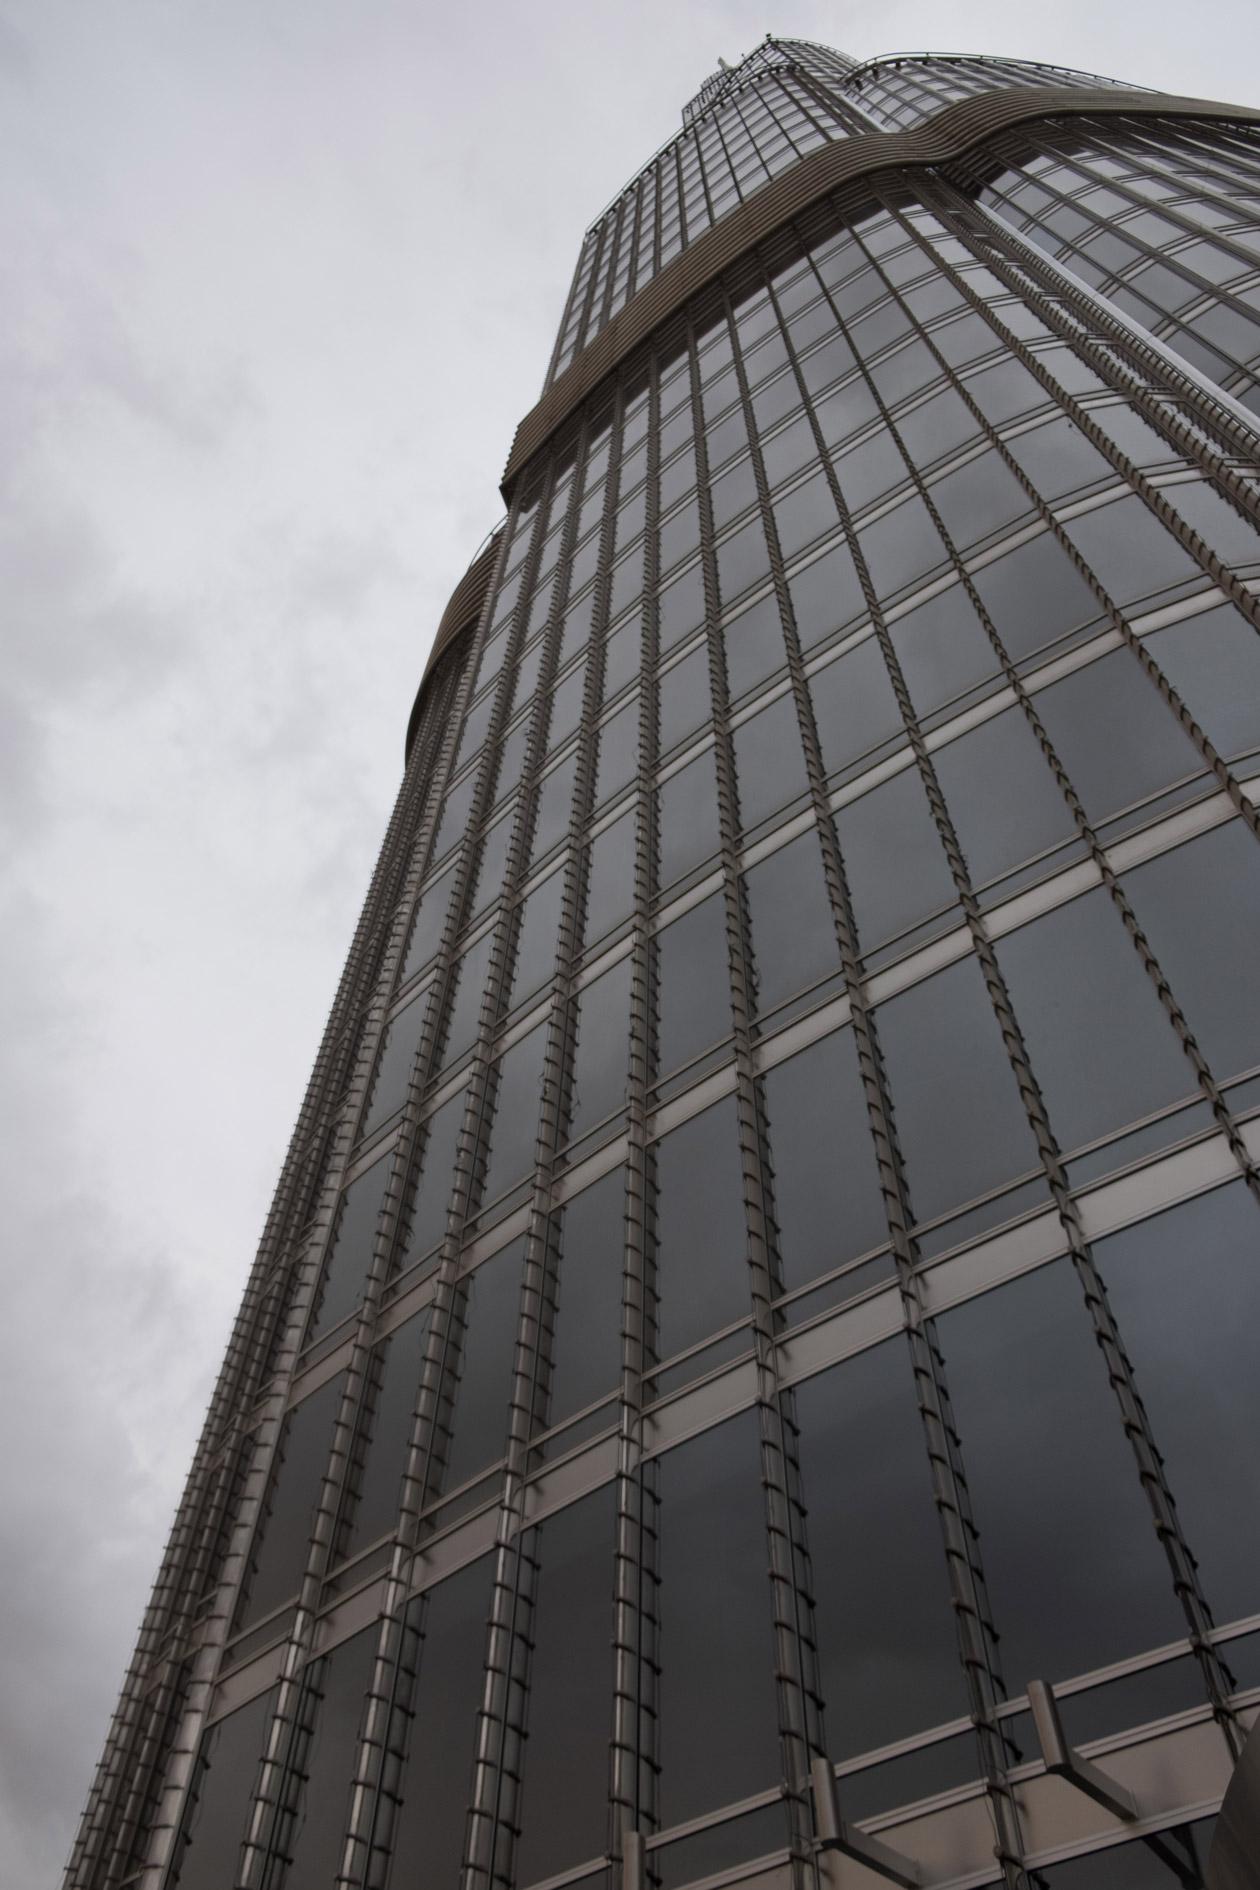 Looking up the Burj Khalifa